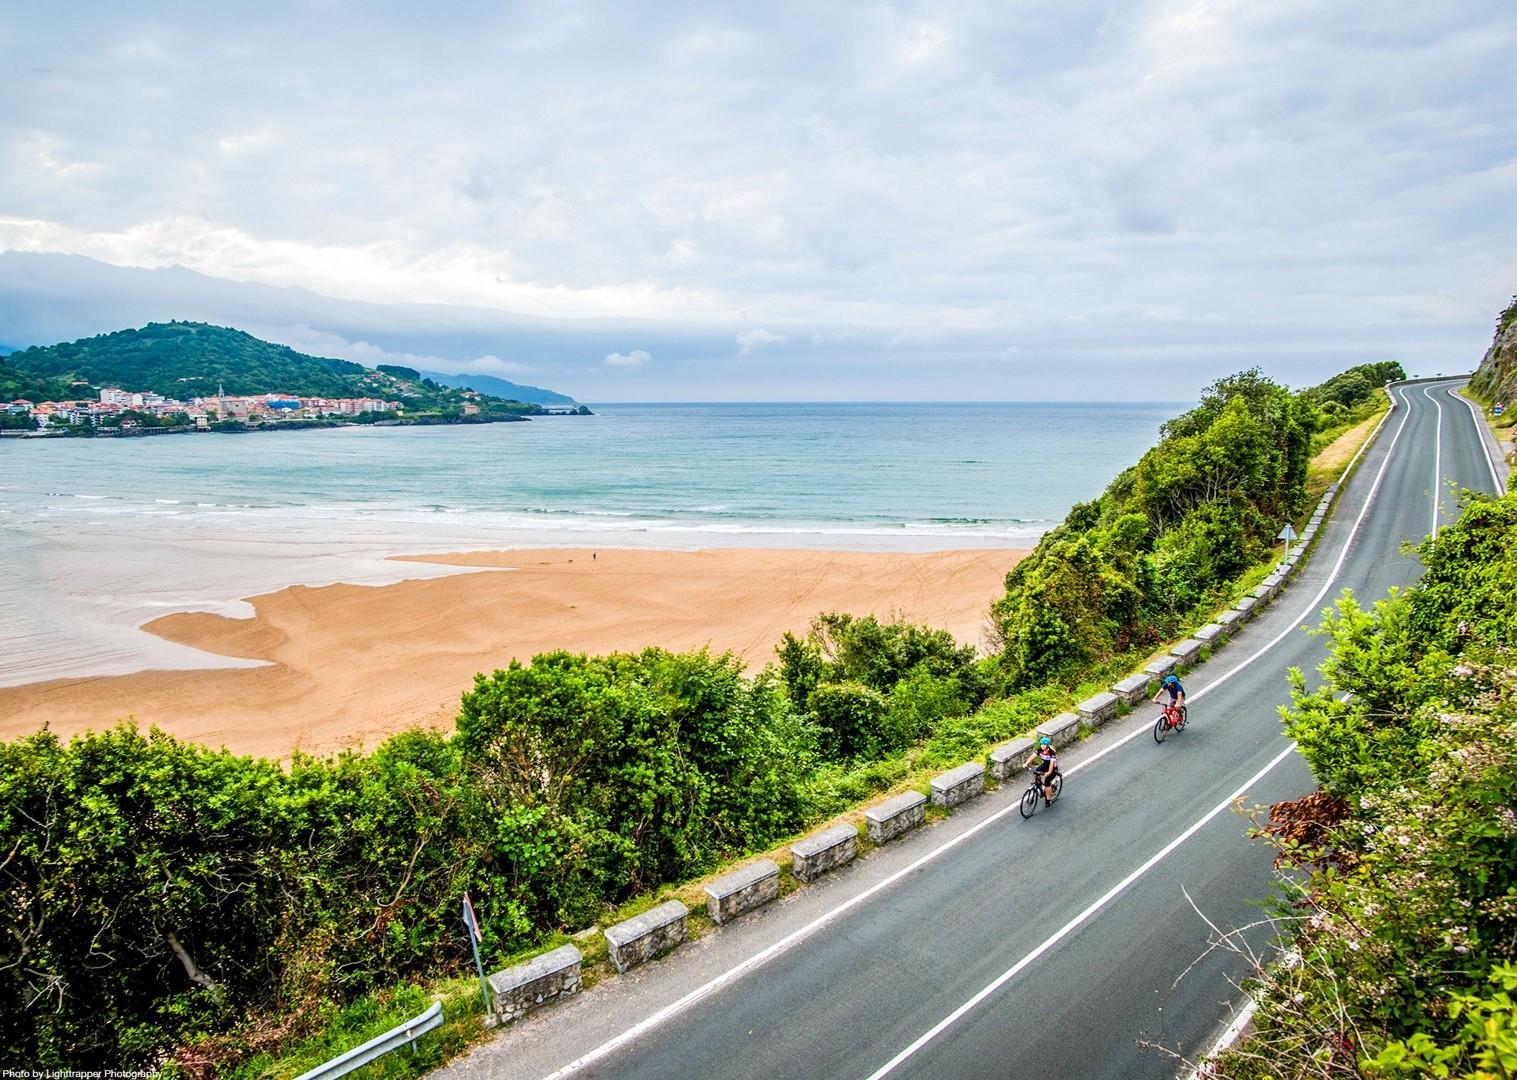 spain-cycling-bilbao-to-san-sebastian-saddle-skeaddle.jpg - NEW! Spain - Bilbao to San Sebastian - Leisure Cycling